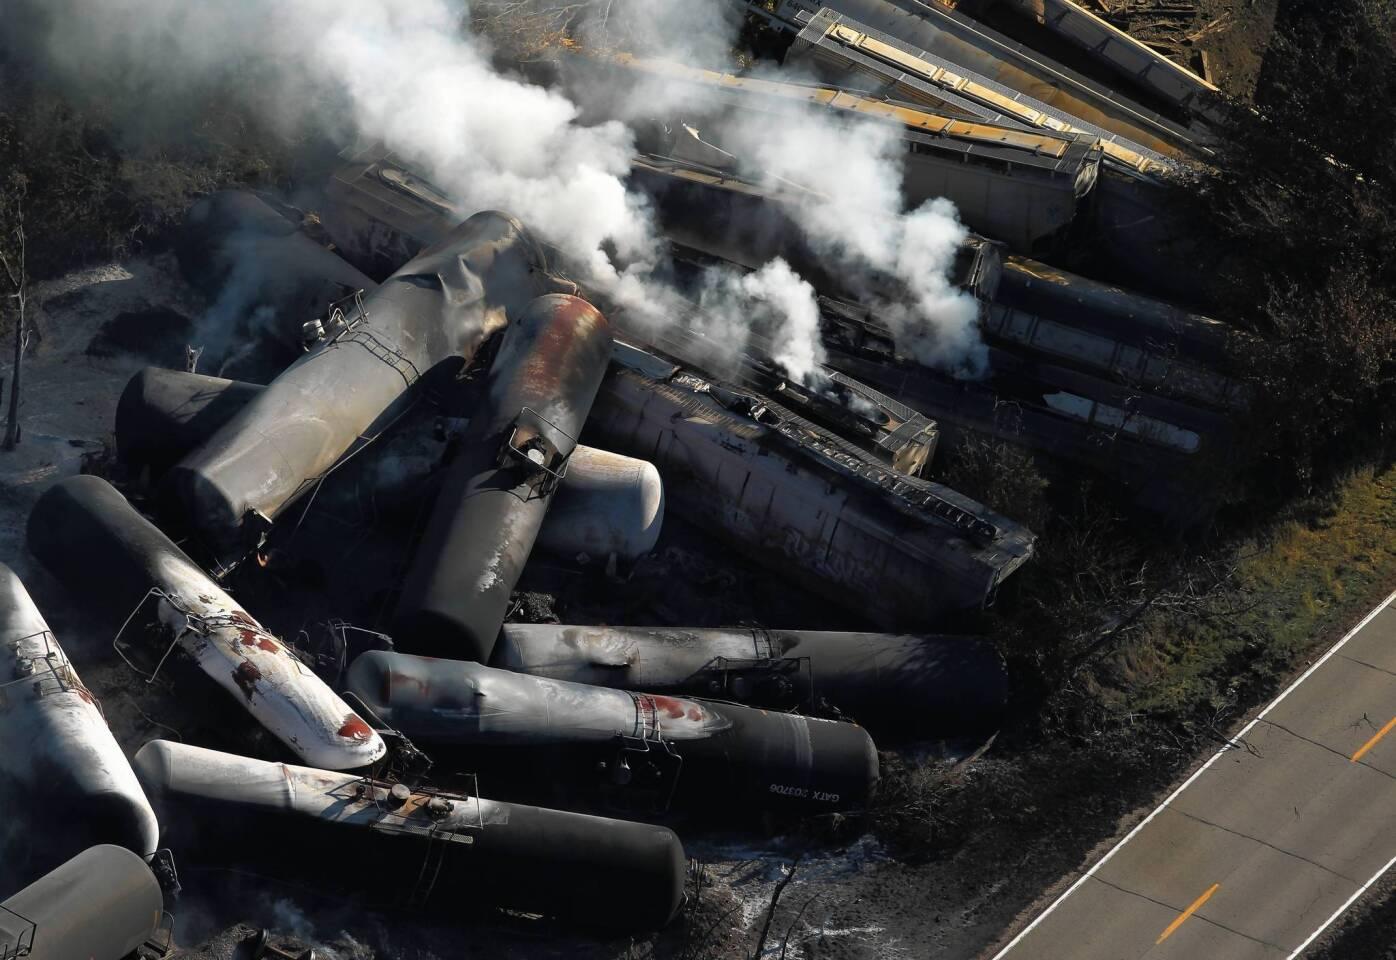 Burning remains of a major train derailment overnight smolder near the town of Tiskilwa.